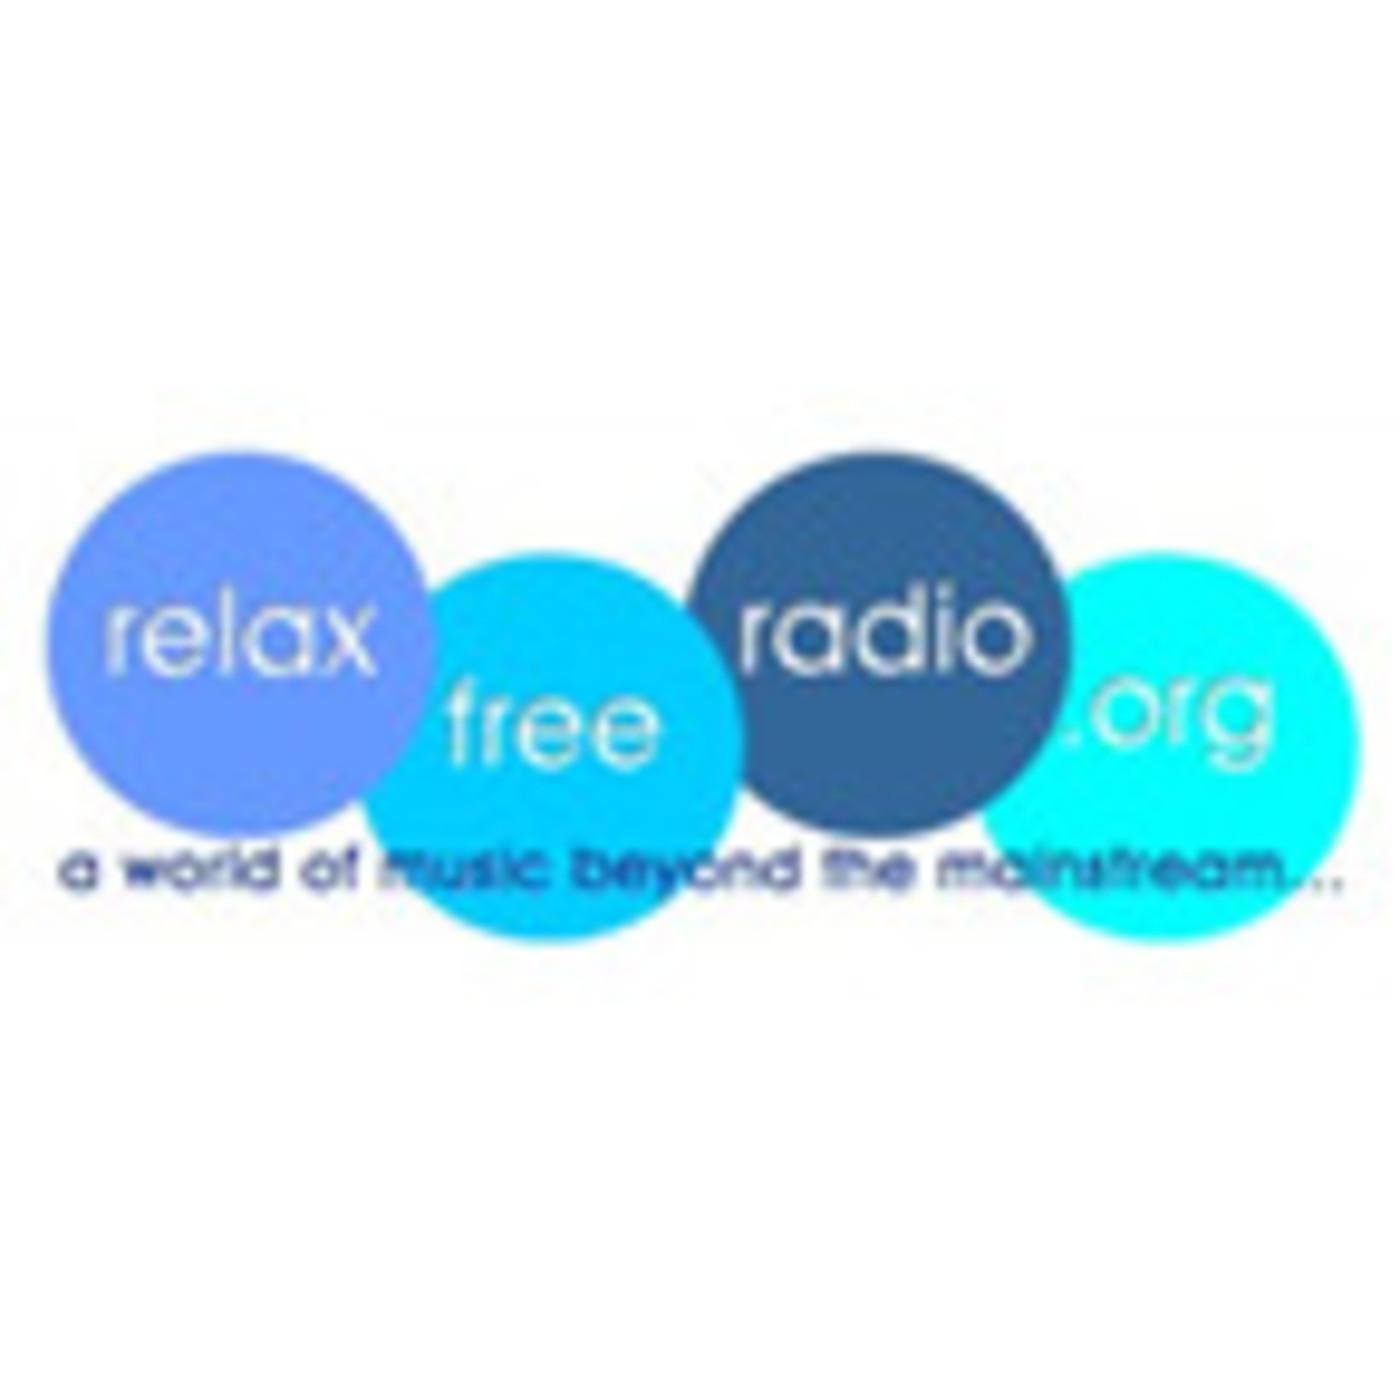 Relax Free Radio